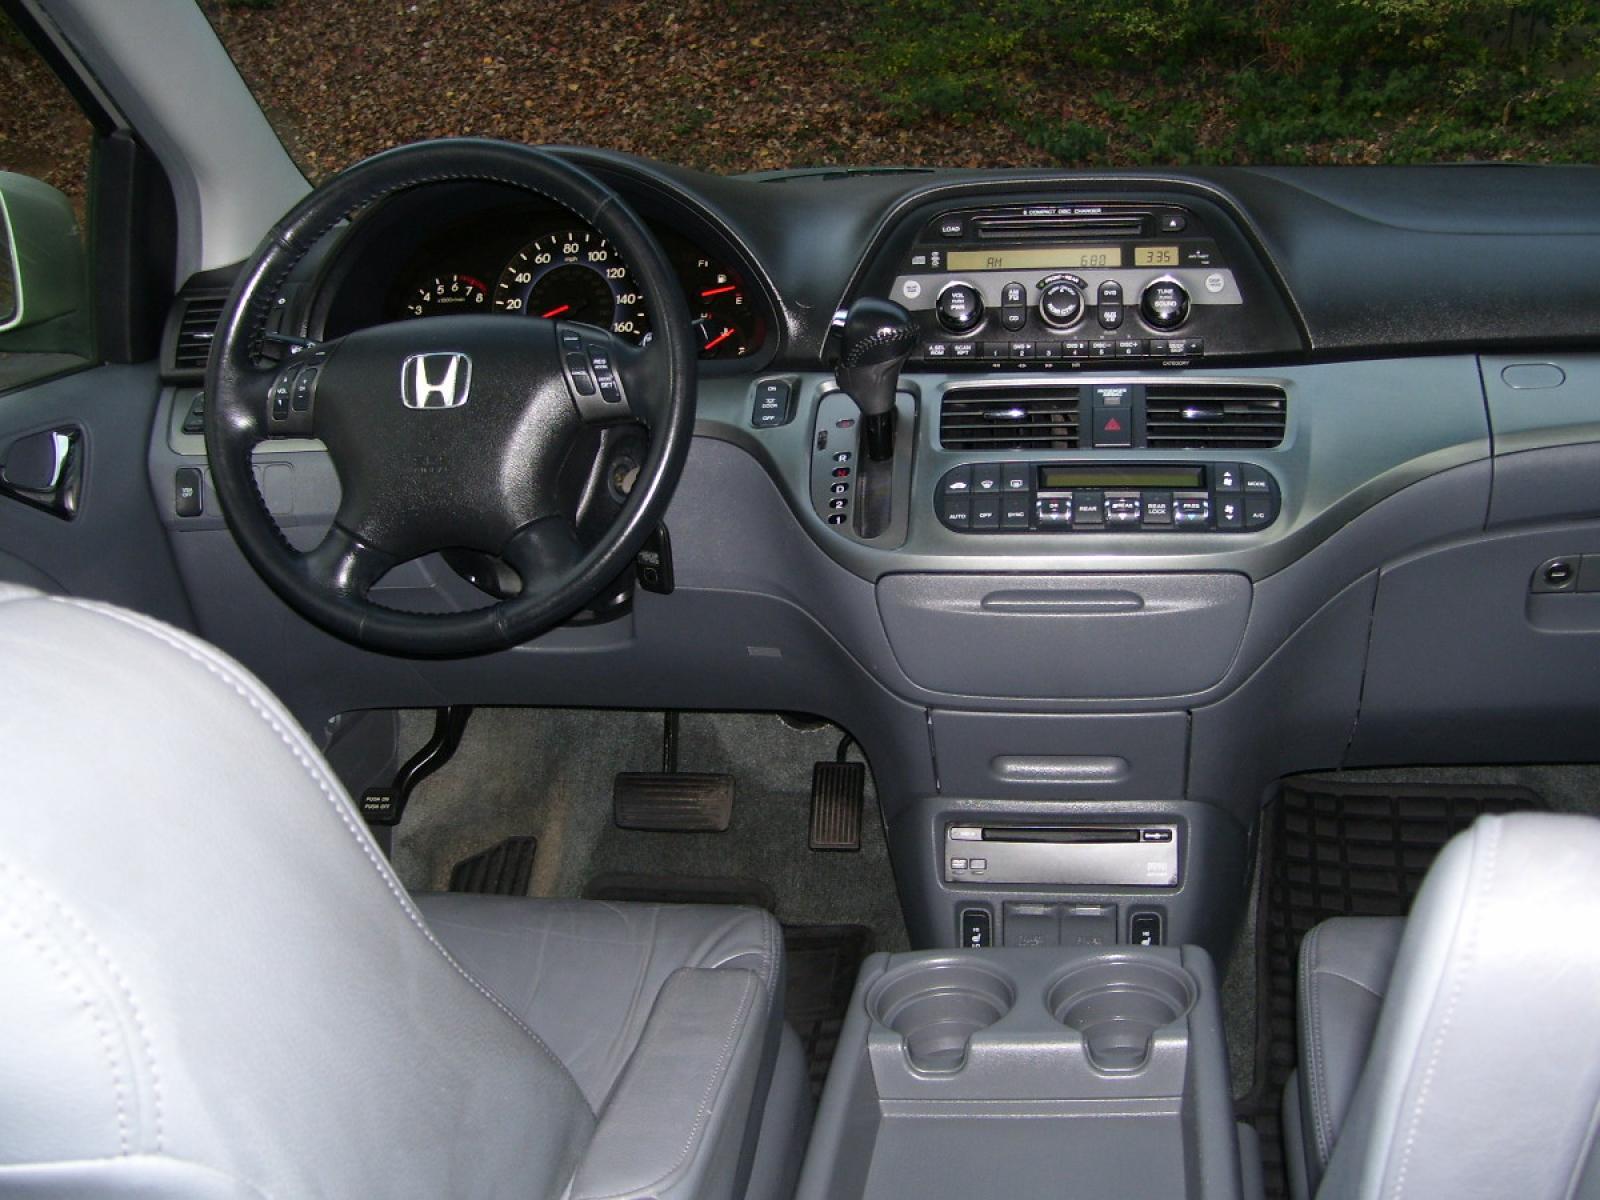 800 1024 1280 1600 Origin 2006 Honda Odyssey ...